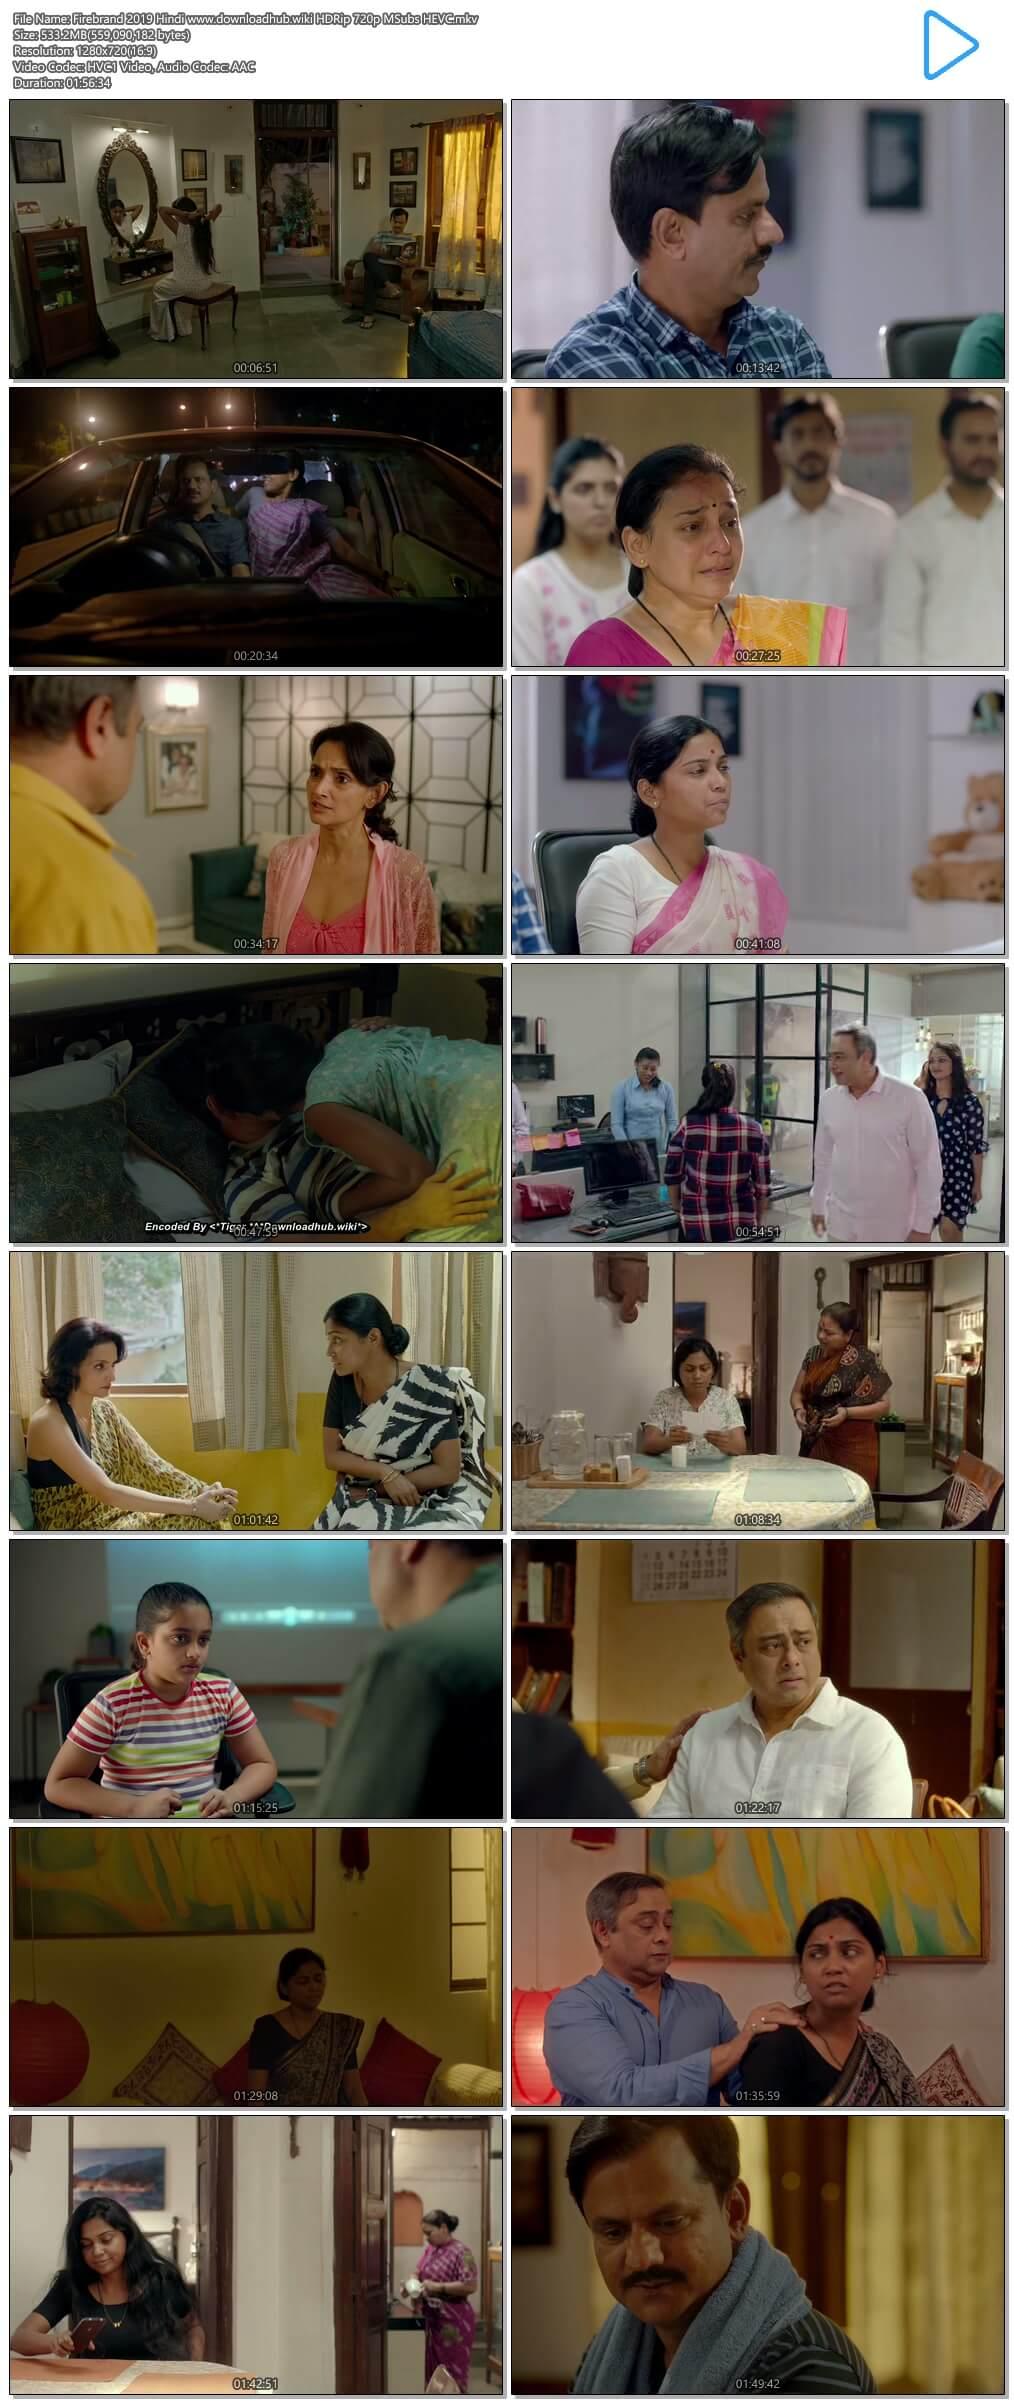 Firebrand 2019 Hindi 500MB HDRip 720p MSubs HEVC